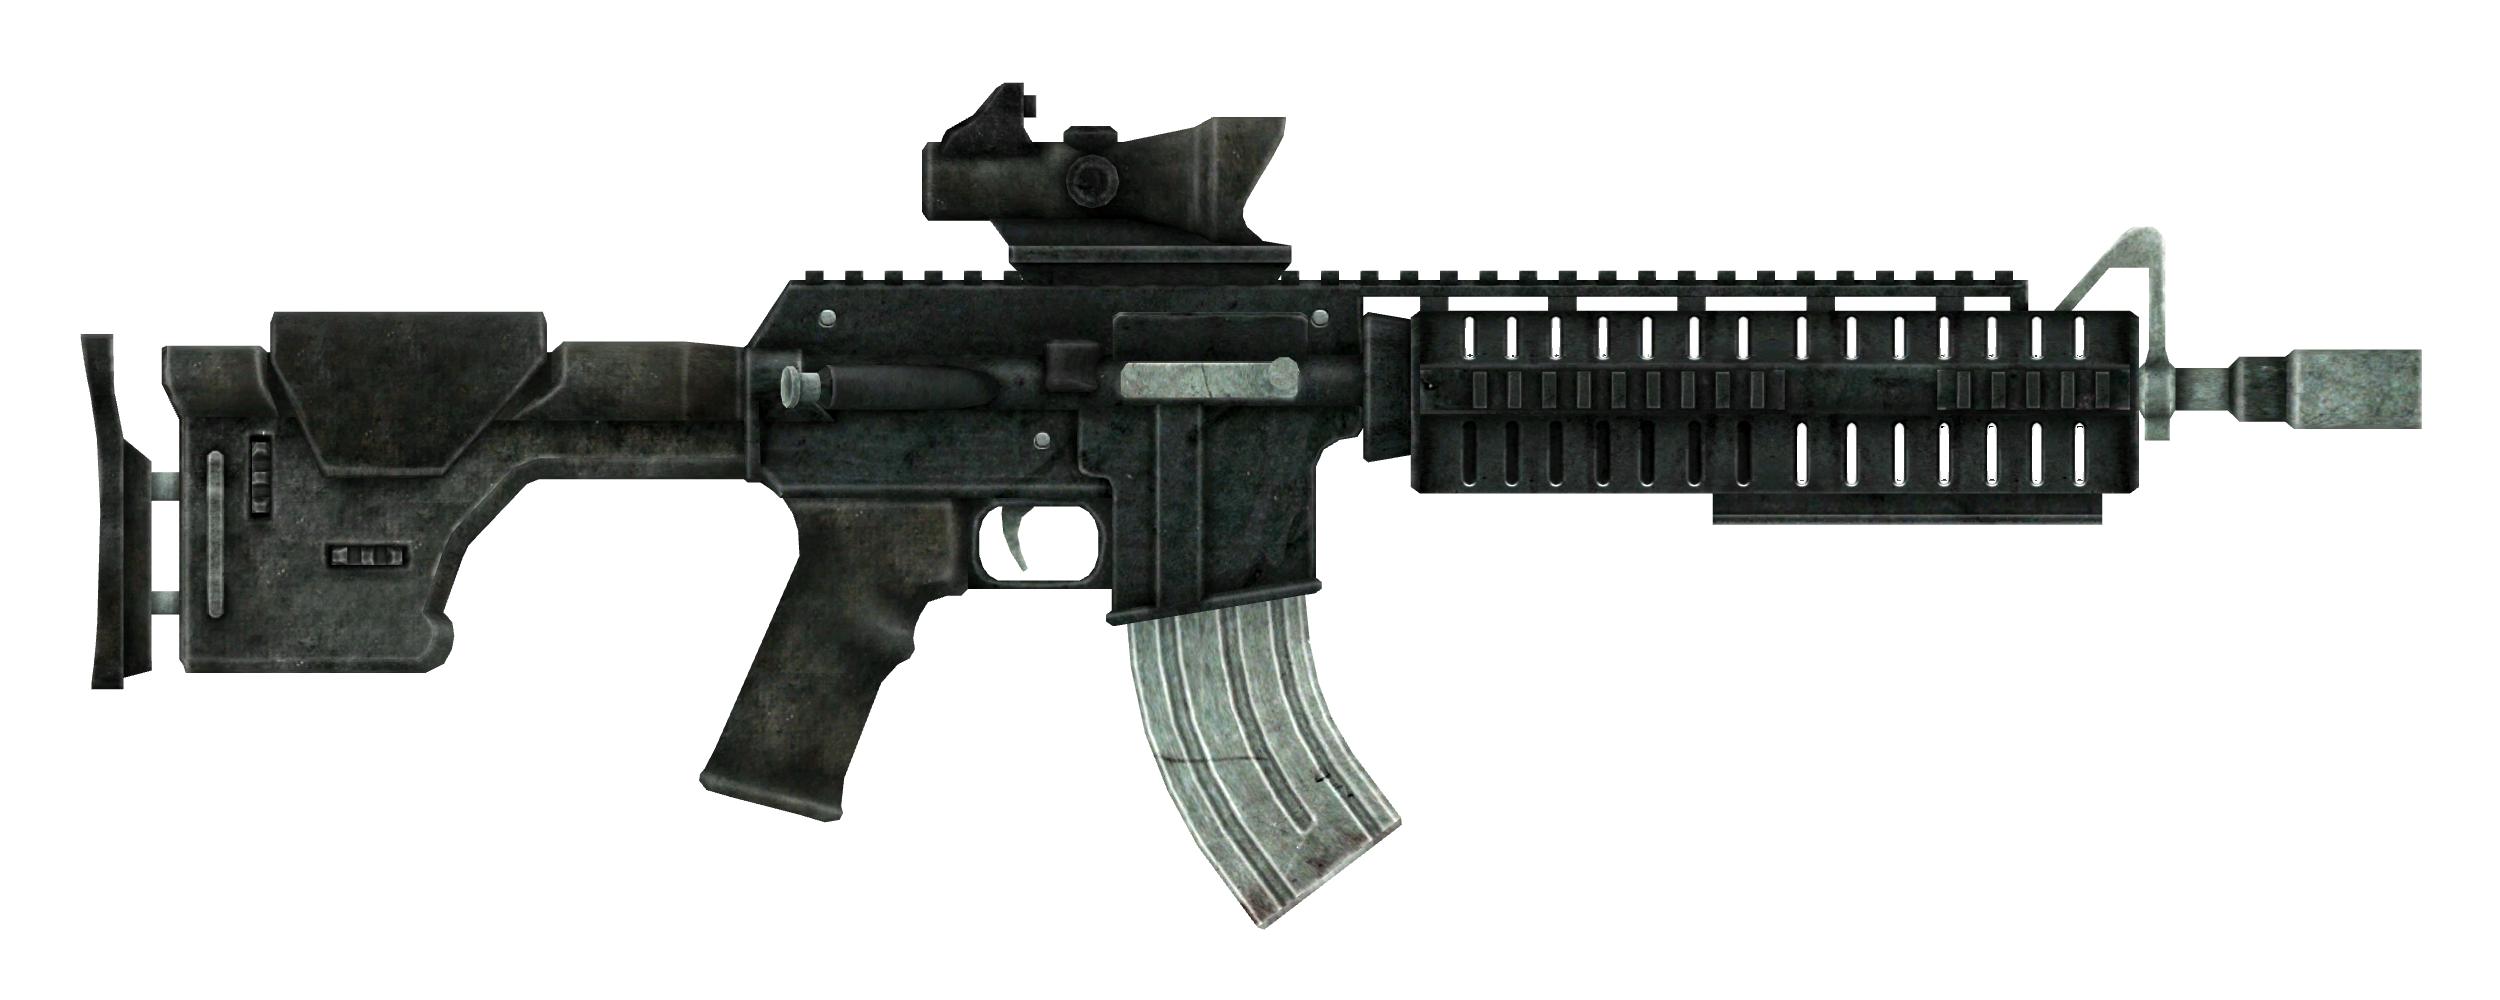 [Image: Marksman_carbine.png]